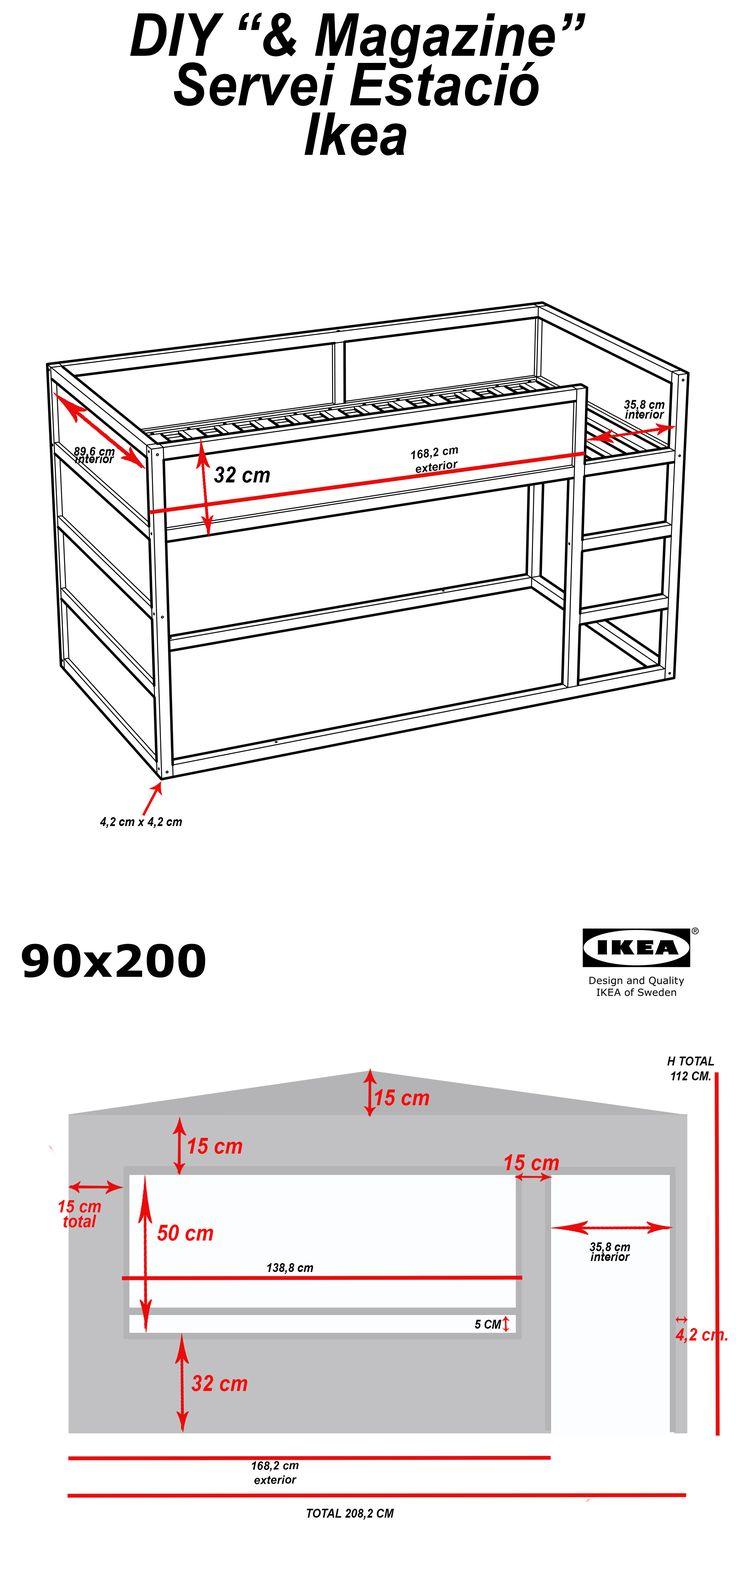 25 best kura bed ideas on pinterest kura bed hack kura hack and ikea baby bed. Black Bedroom Furniture Sets. Home Design Ideas